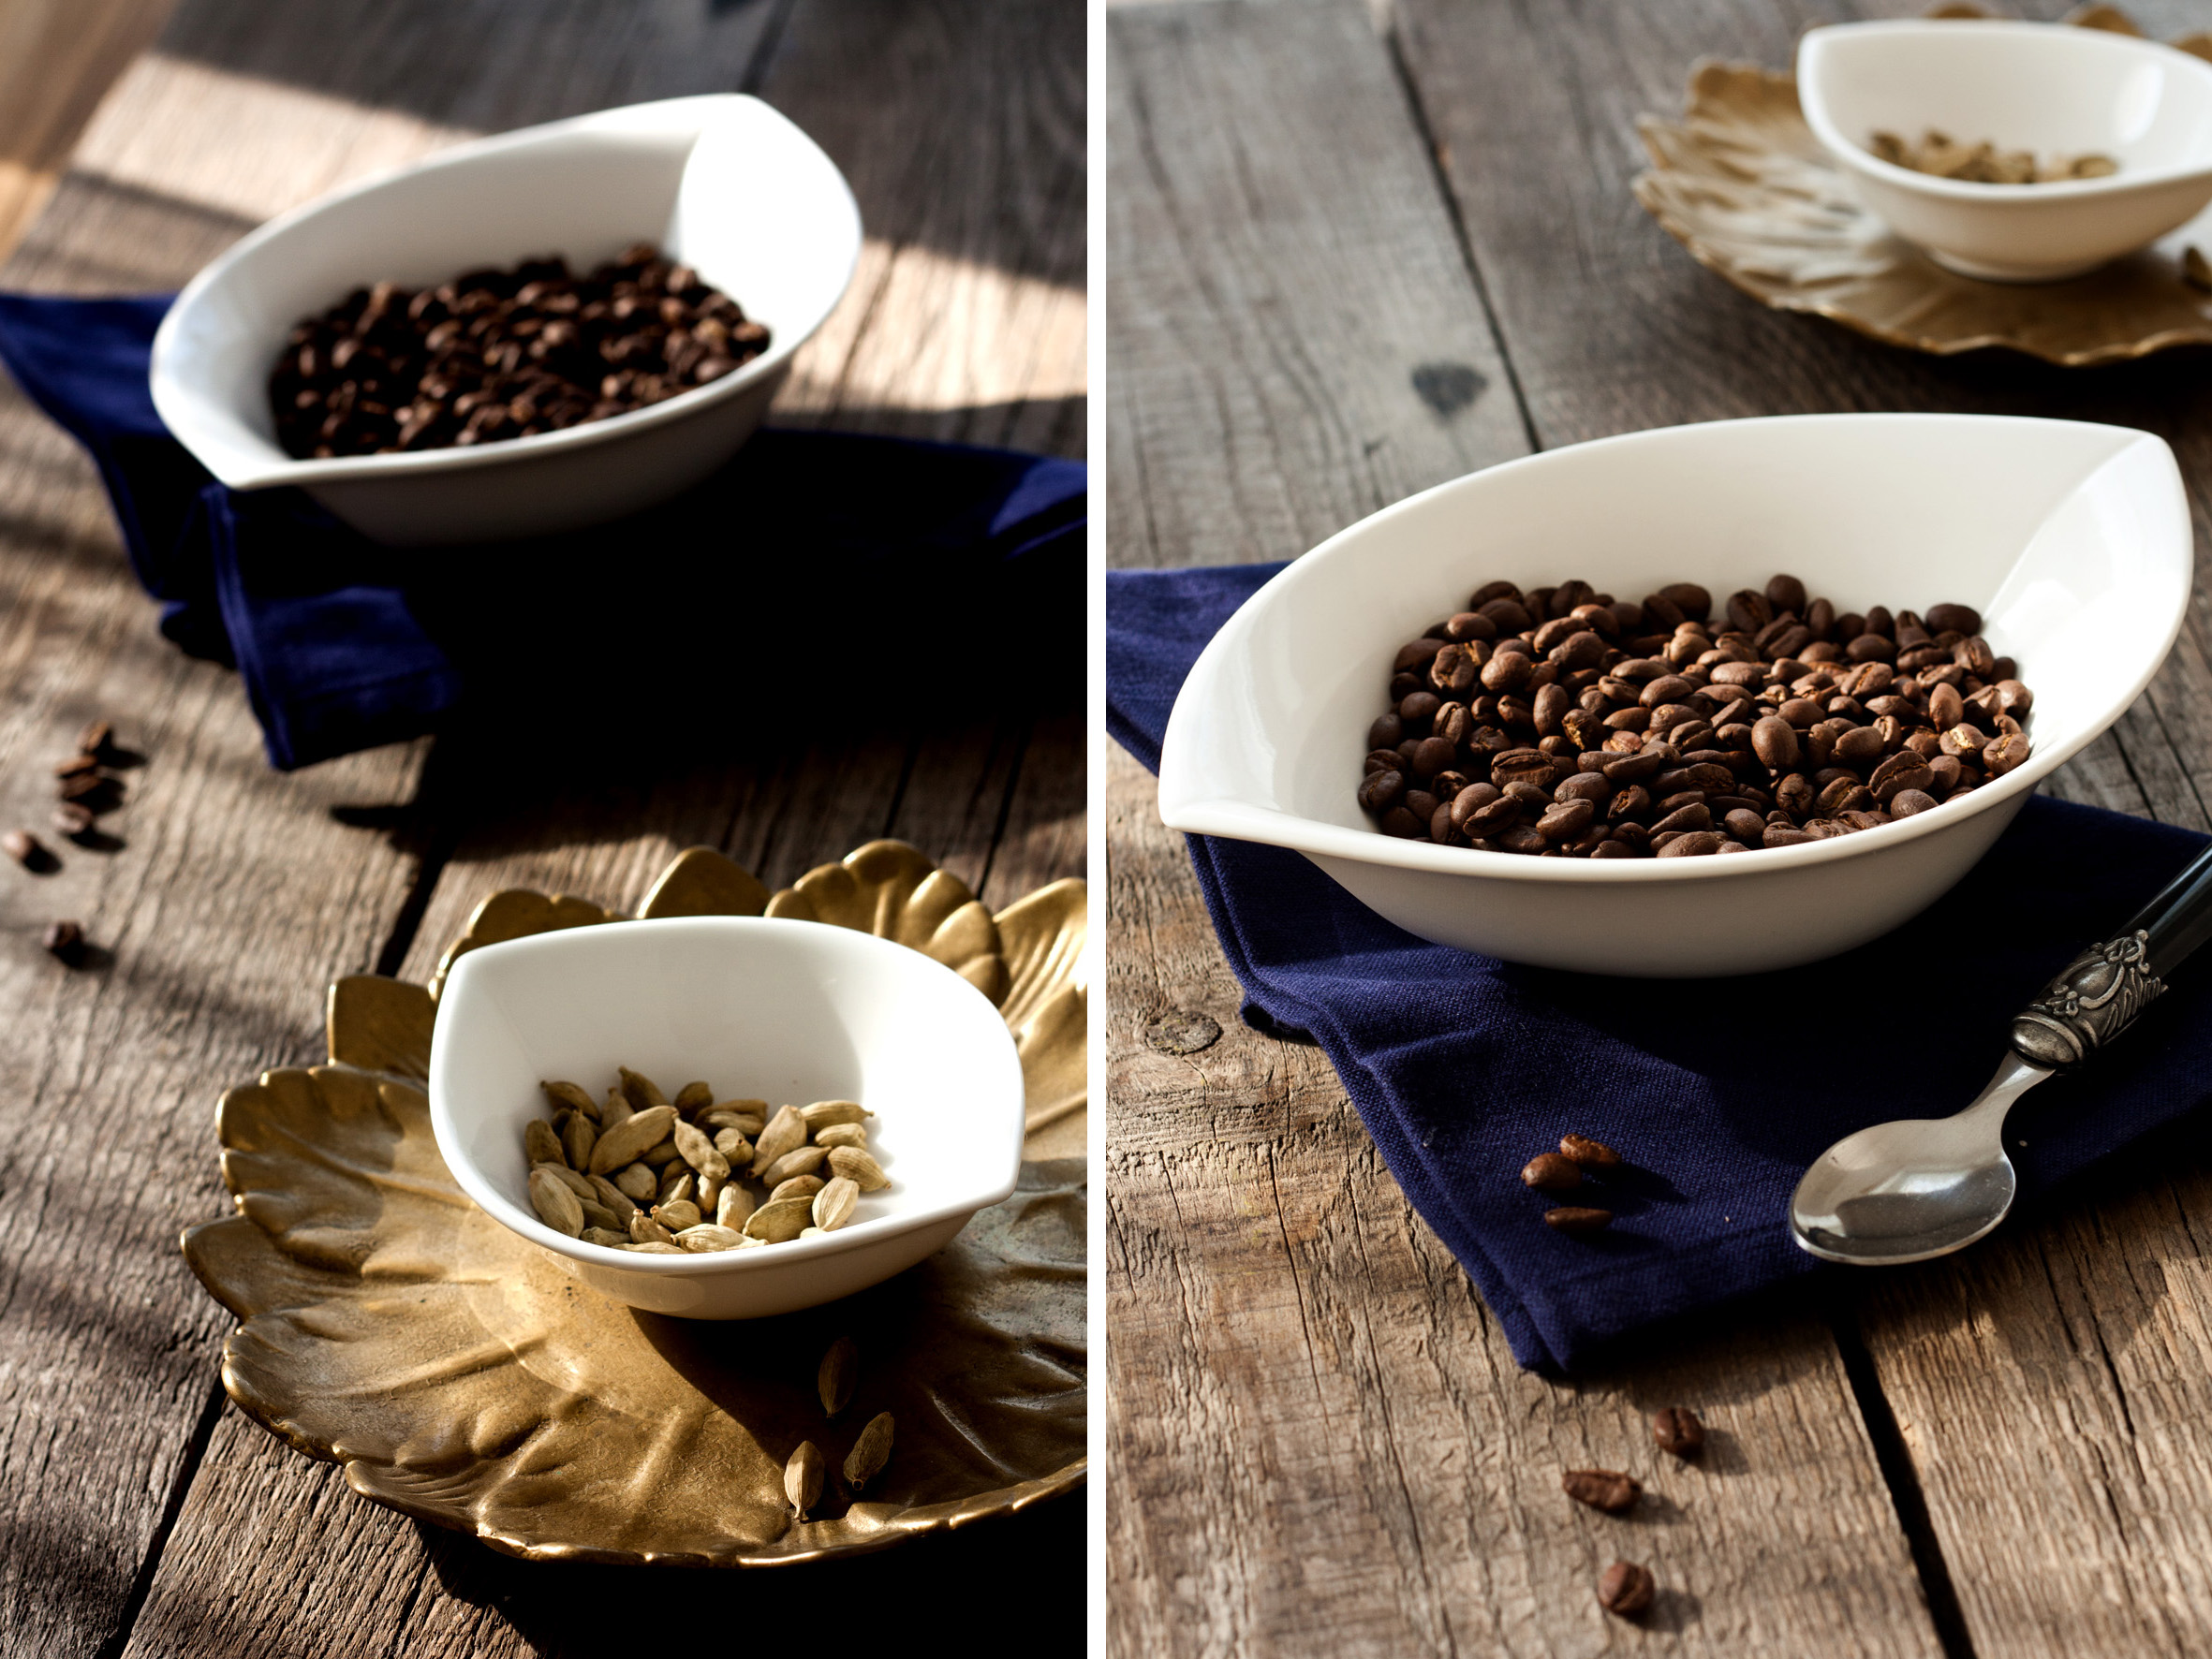 kaffee-risotto-ziegenkaese-6